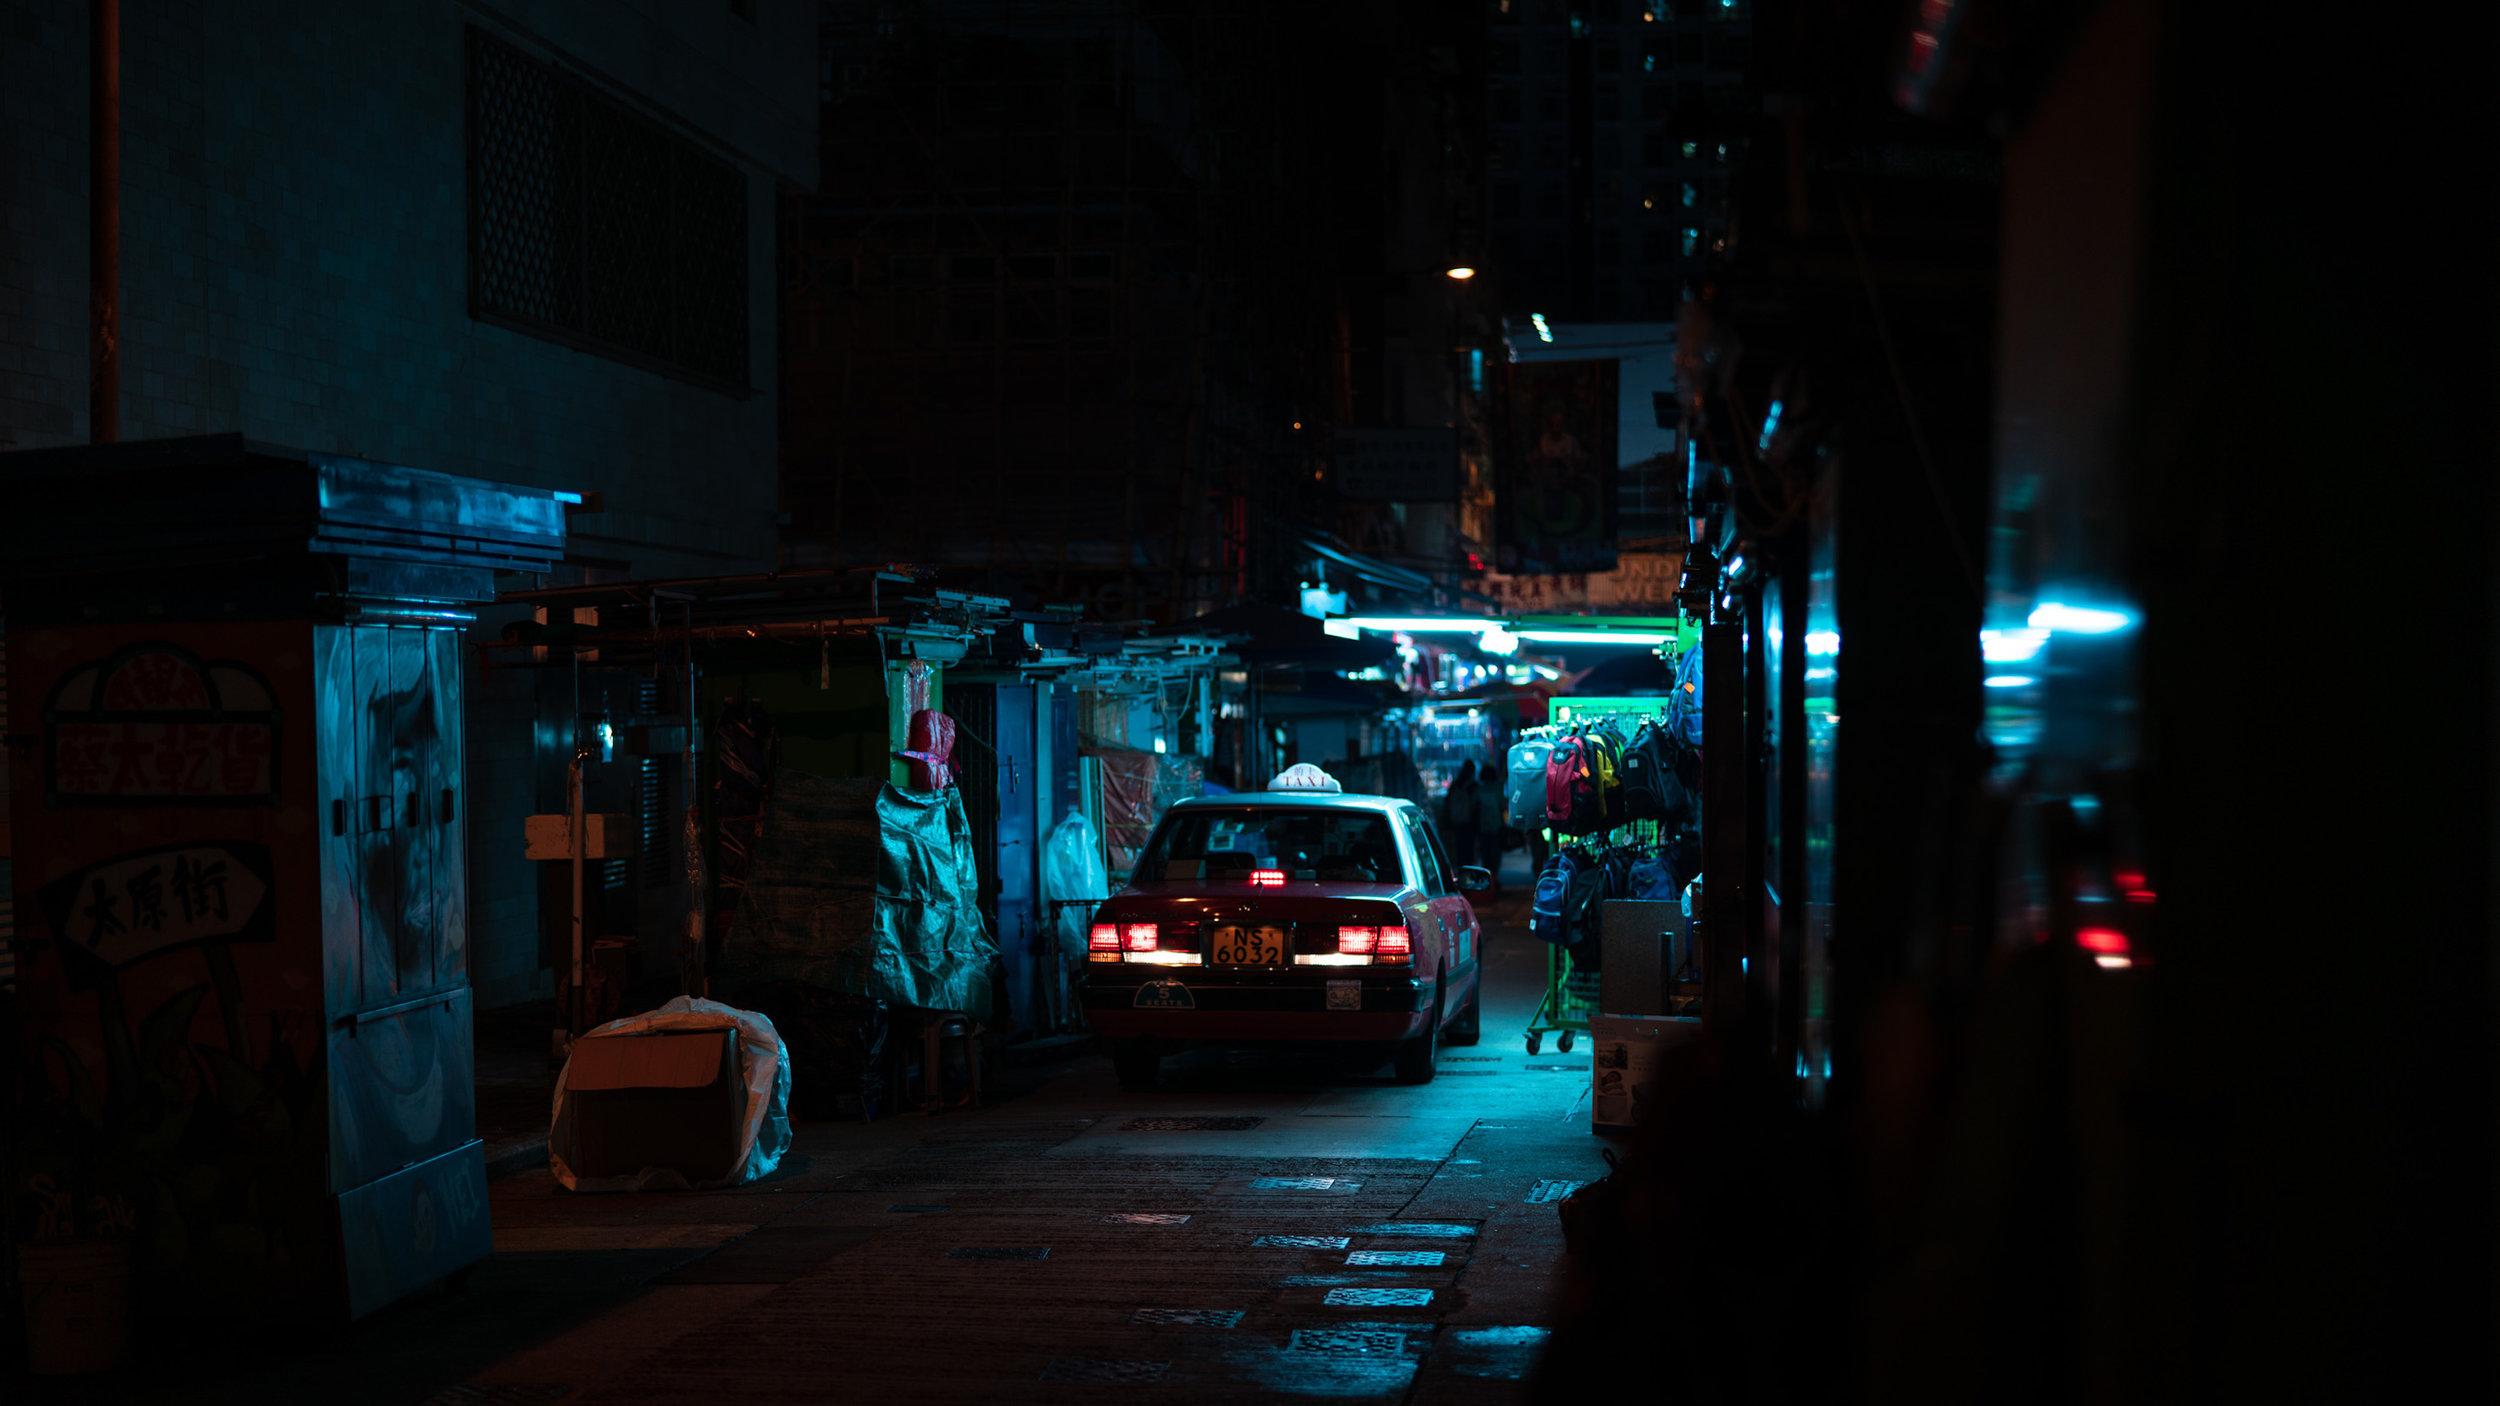 img4-taxi.jpg